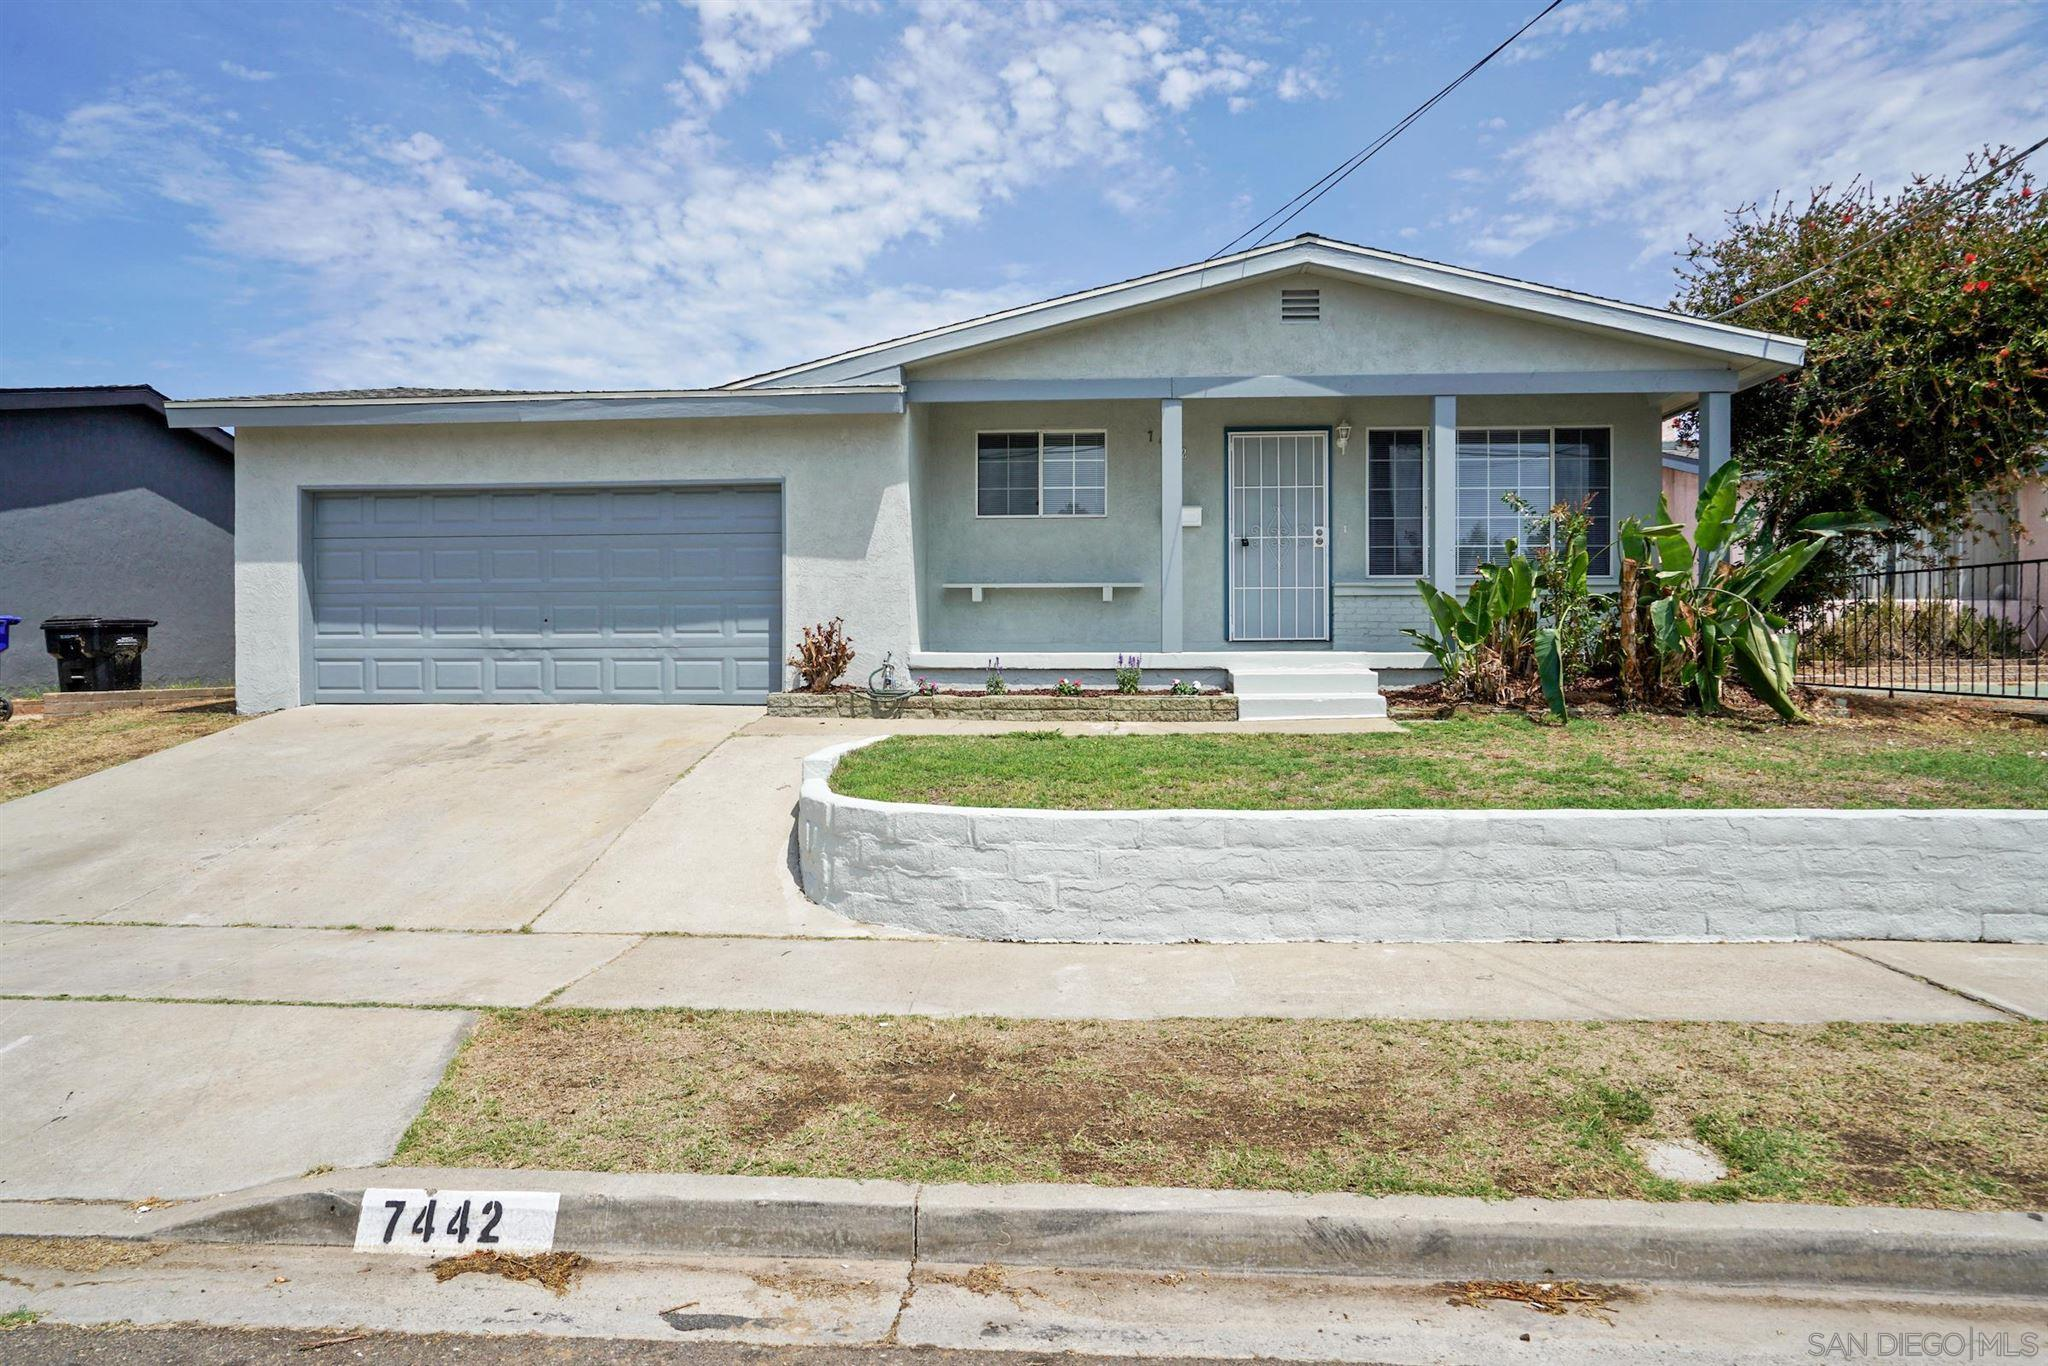 7442 Batista St, San Diego, CA 92111